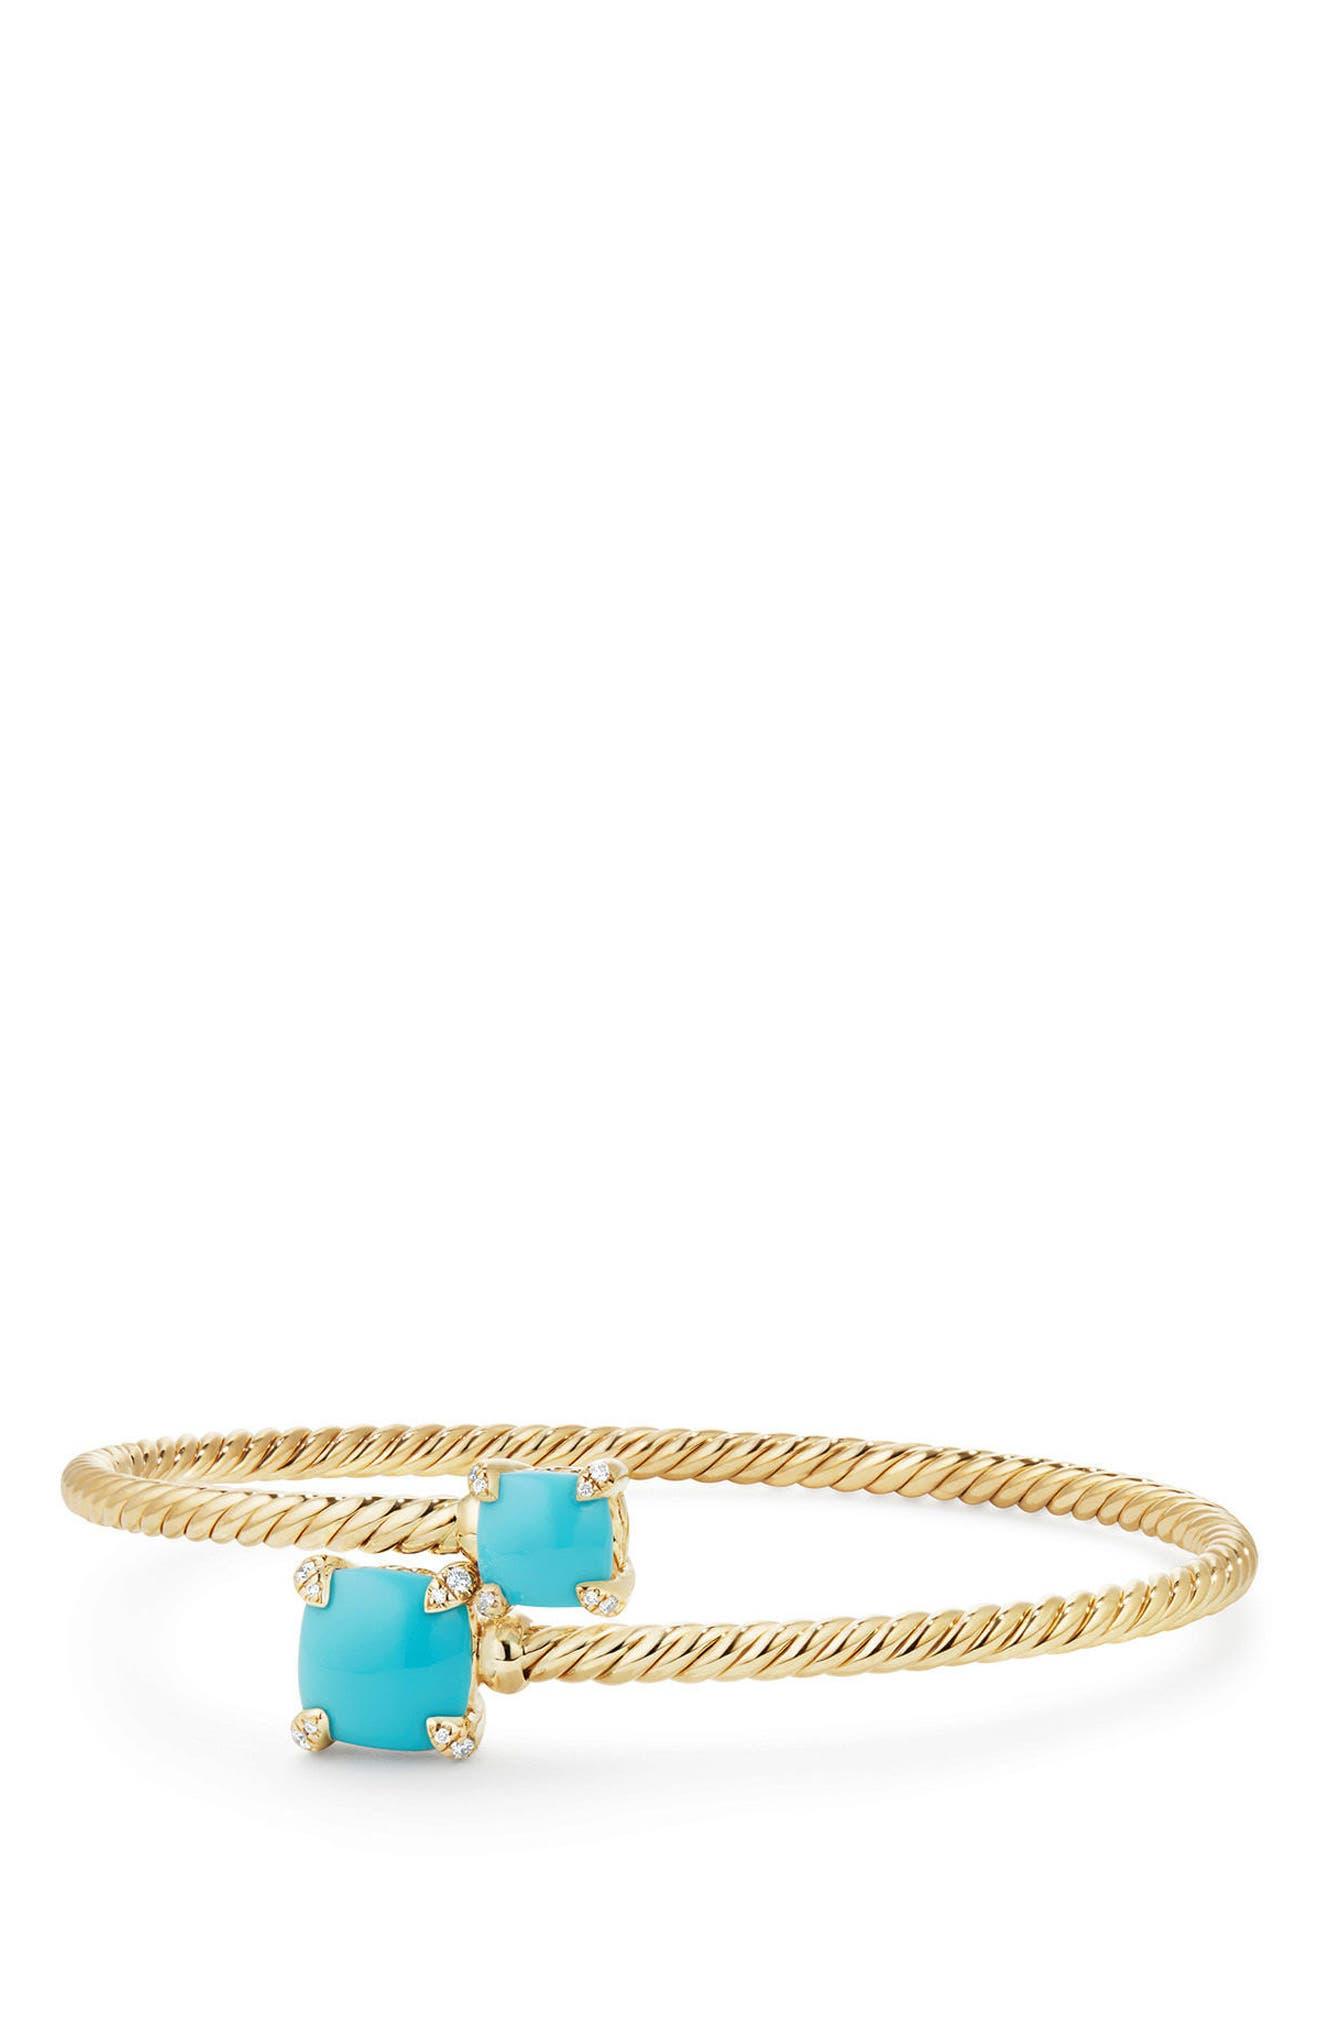 David Yurman Châtelaine Bypass Bracelet with Semiprecious Stone & Diamonds in 18K Gold